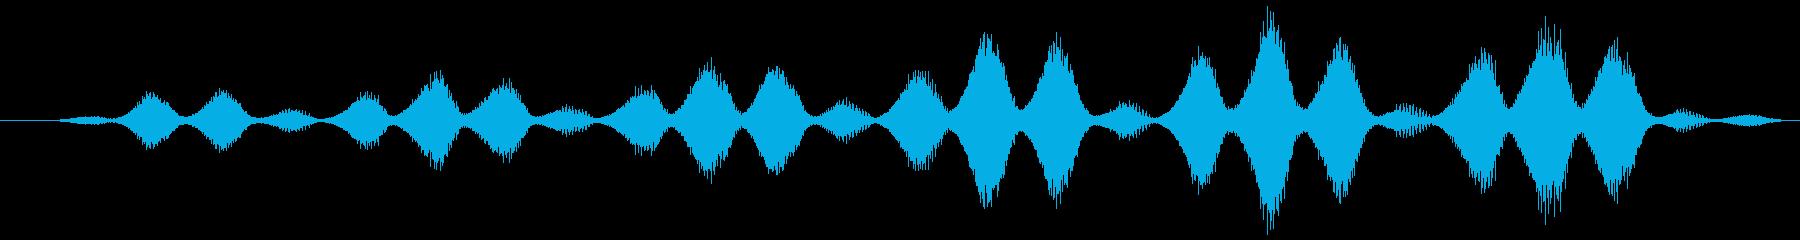 SPACE RETINAL SCA...の再生済みの波形